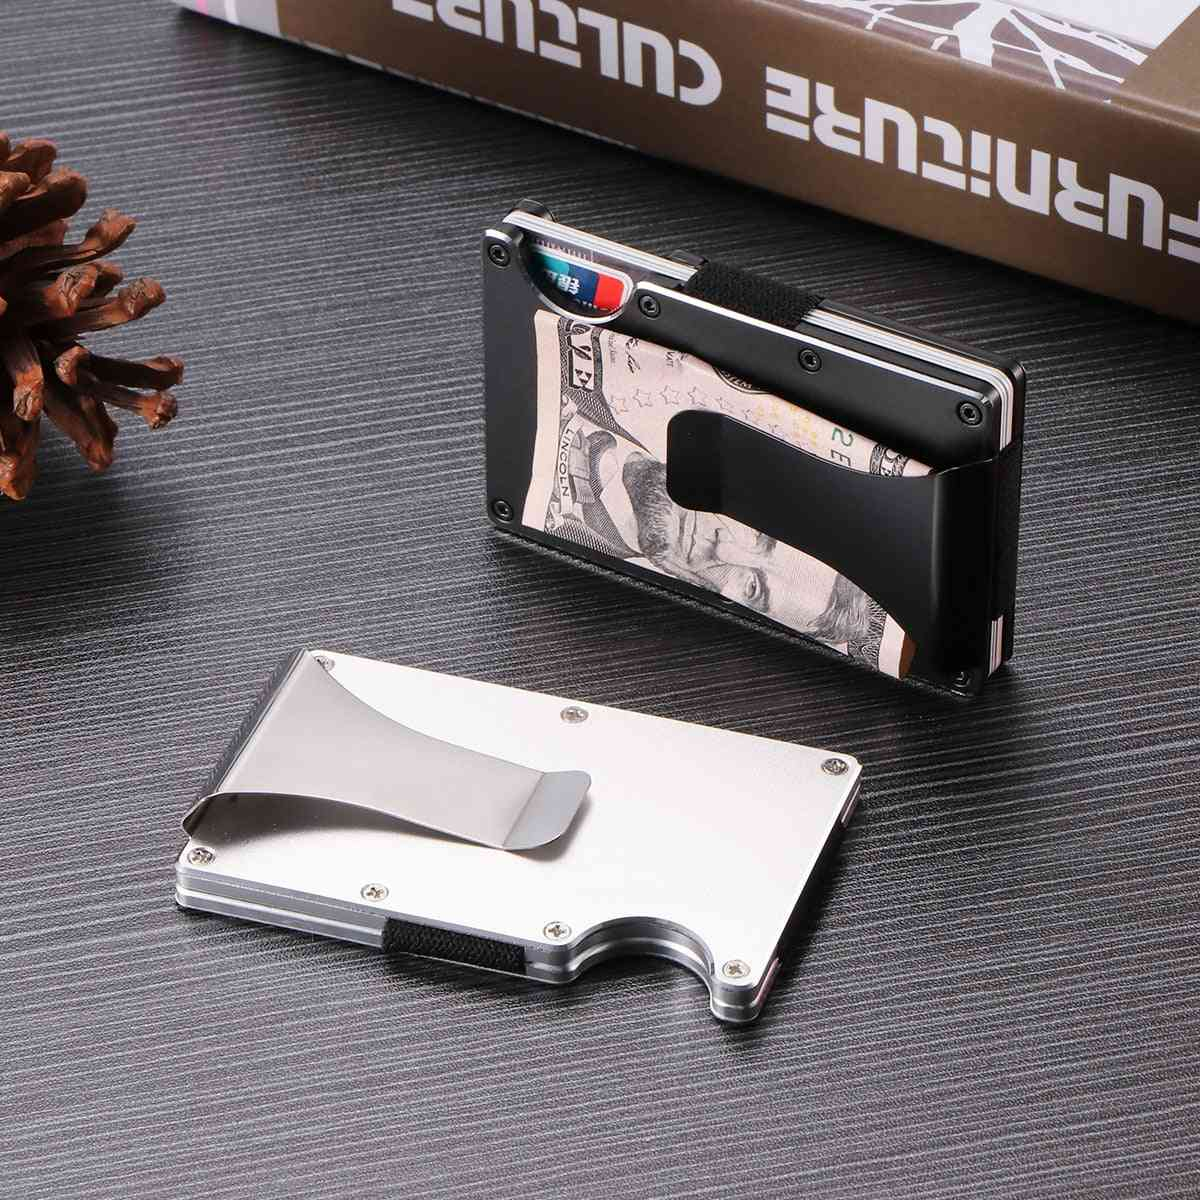 Carbon Fiber Wallet Money Clip - Metal Card Pack Wallet Thin Bills Cash Clips